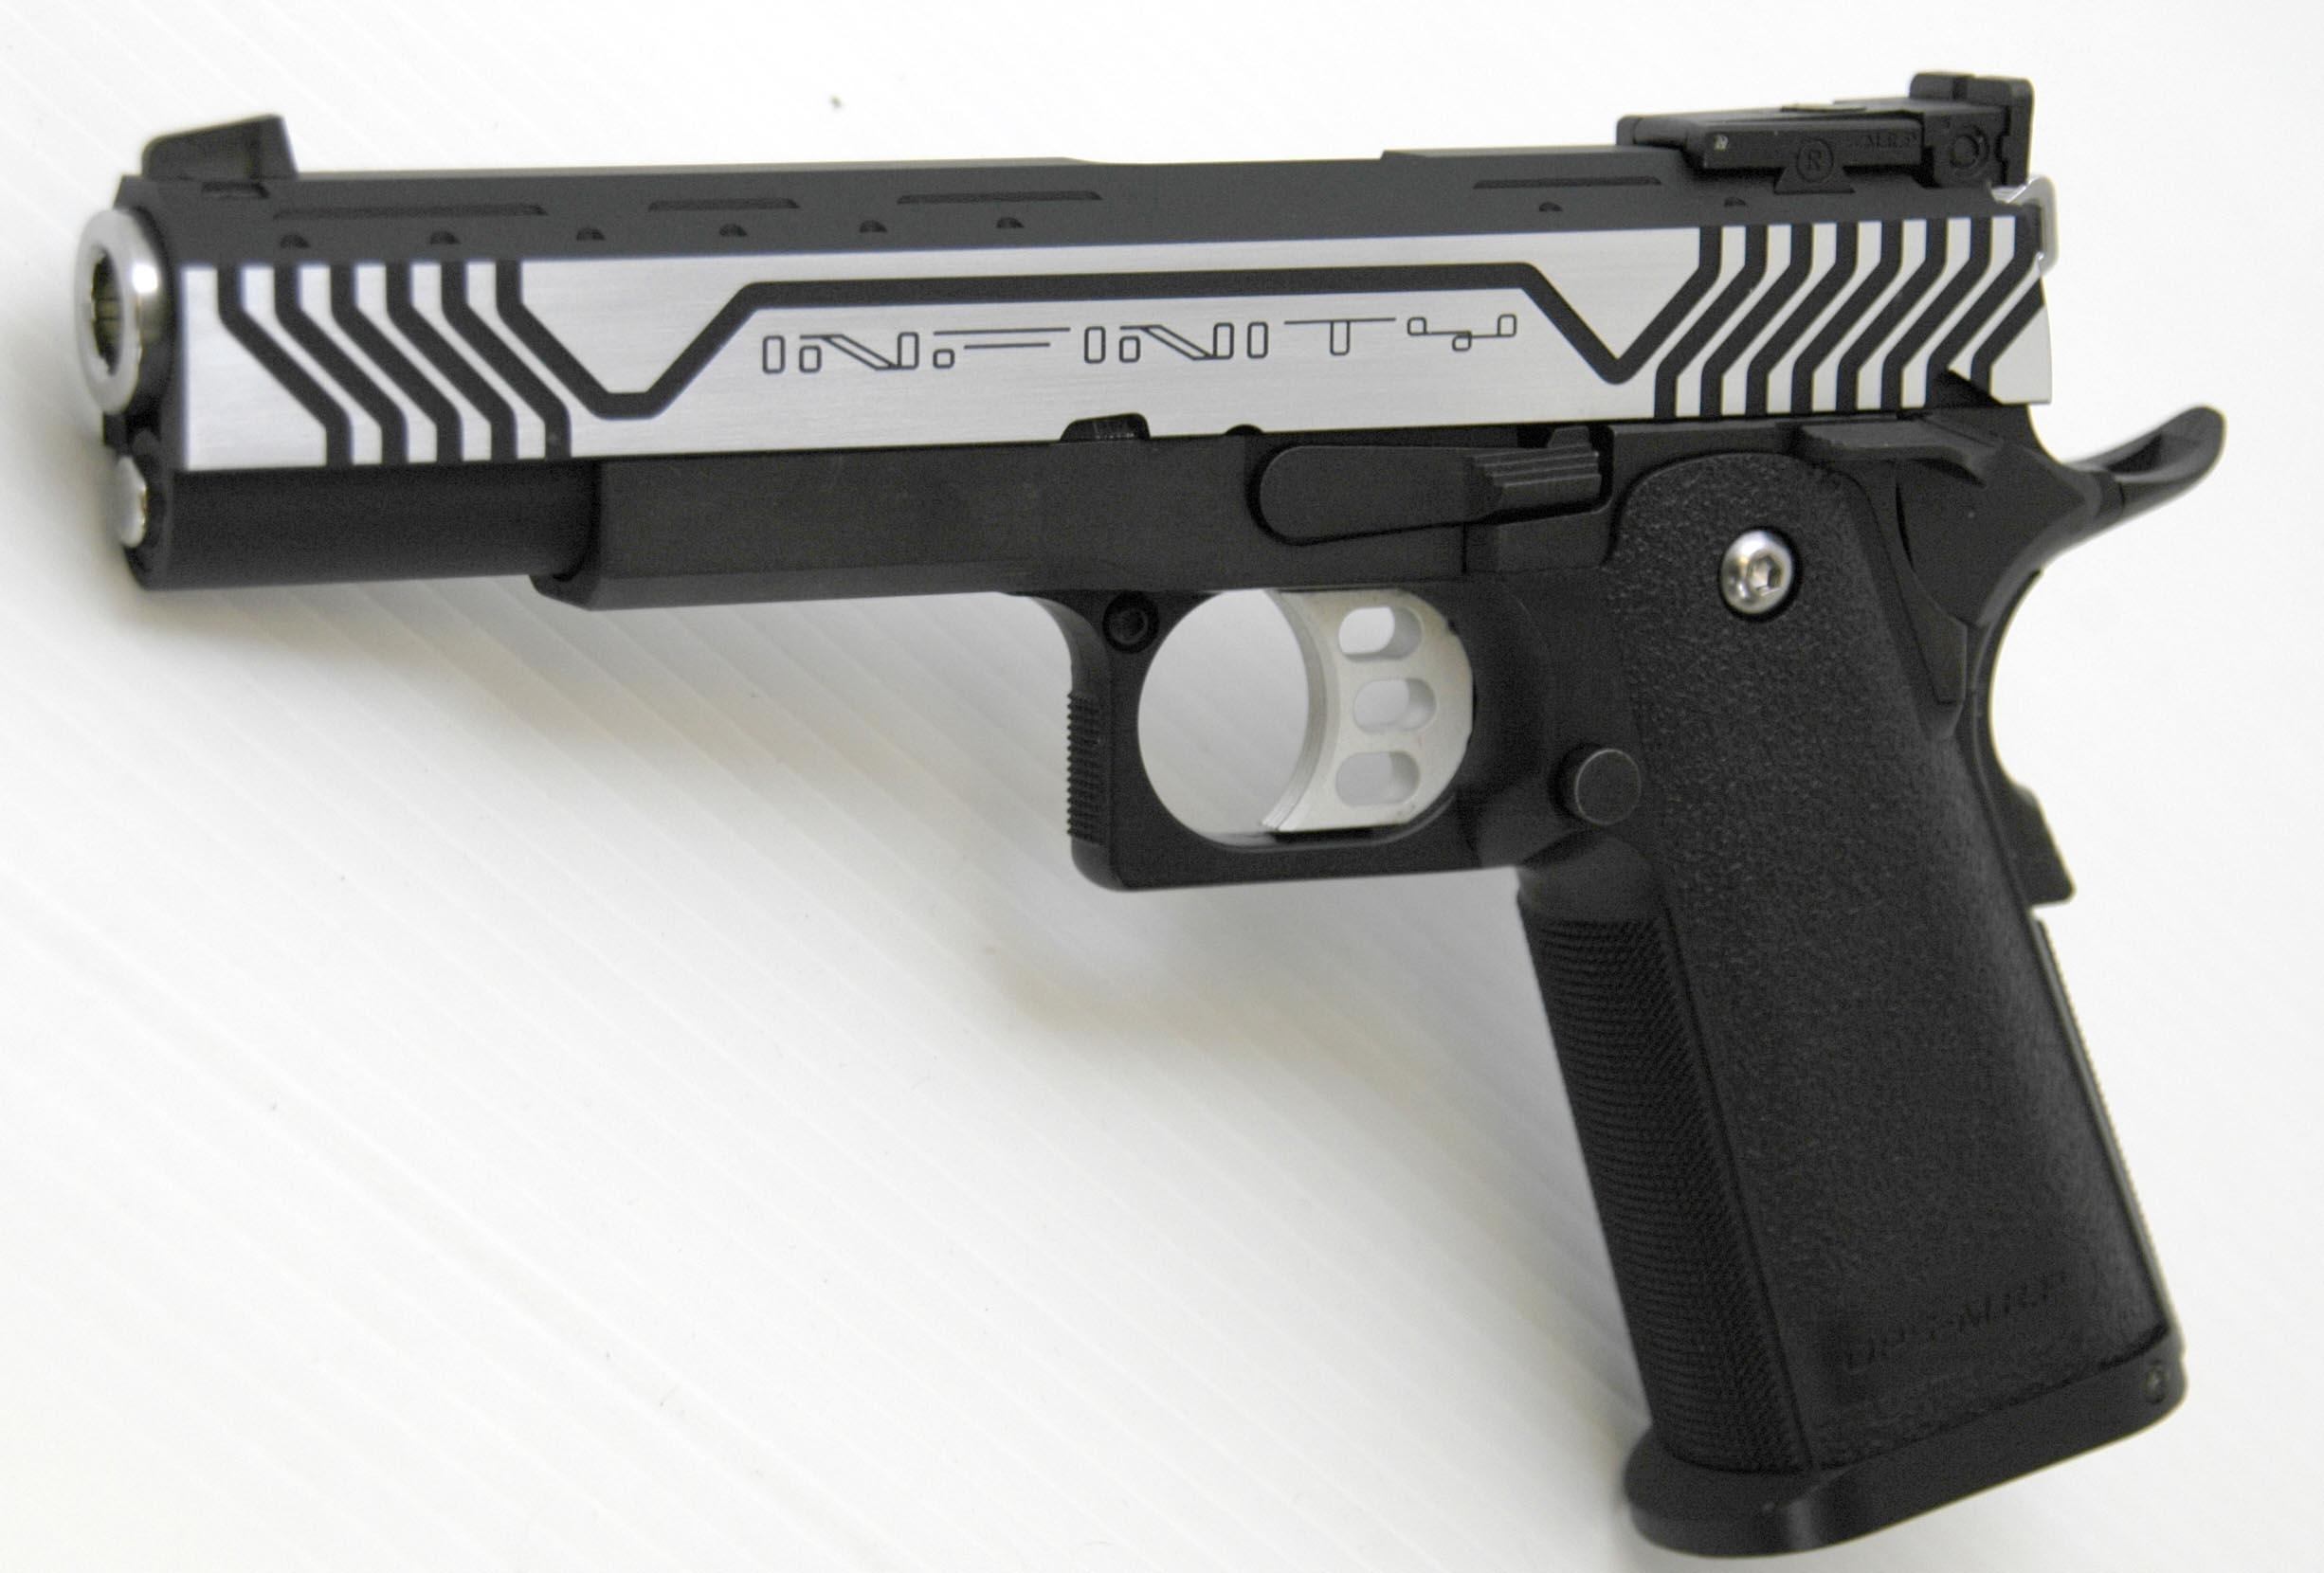 handmade pistols 28 images custom guns gun reviews  : TM20signature20C2A322400 from 45.77.75.244 size 2452 x 1660 jpeg 820kB